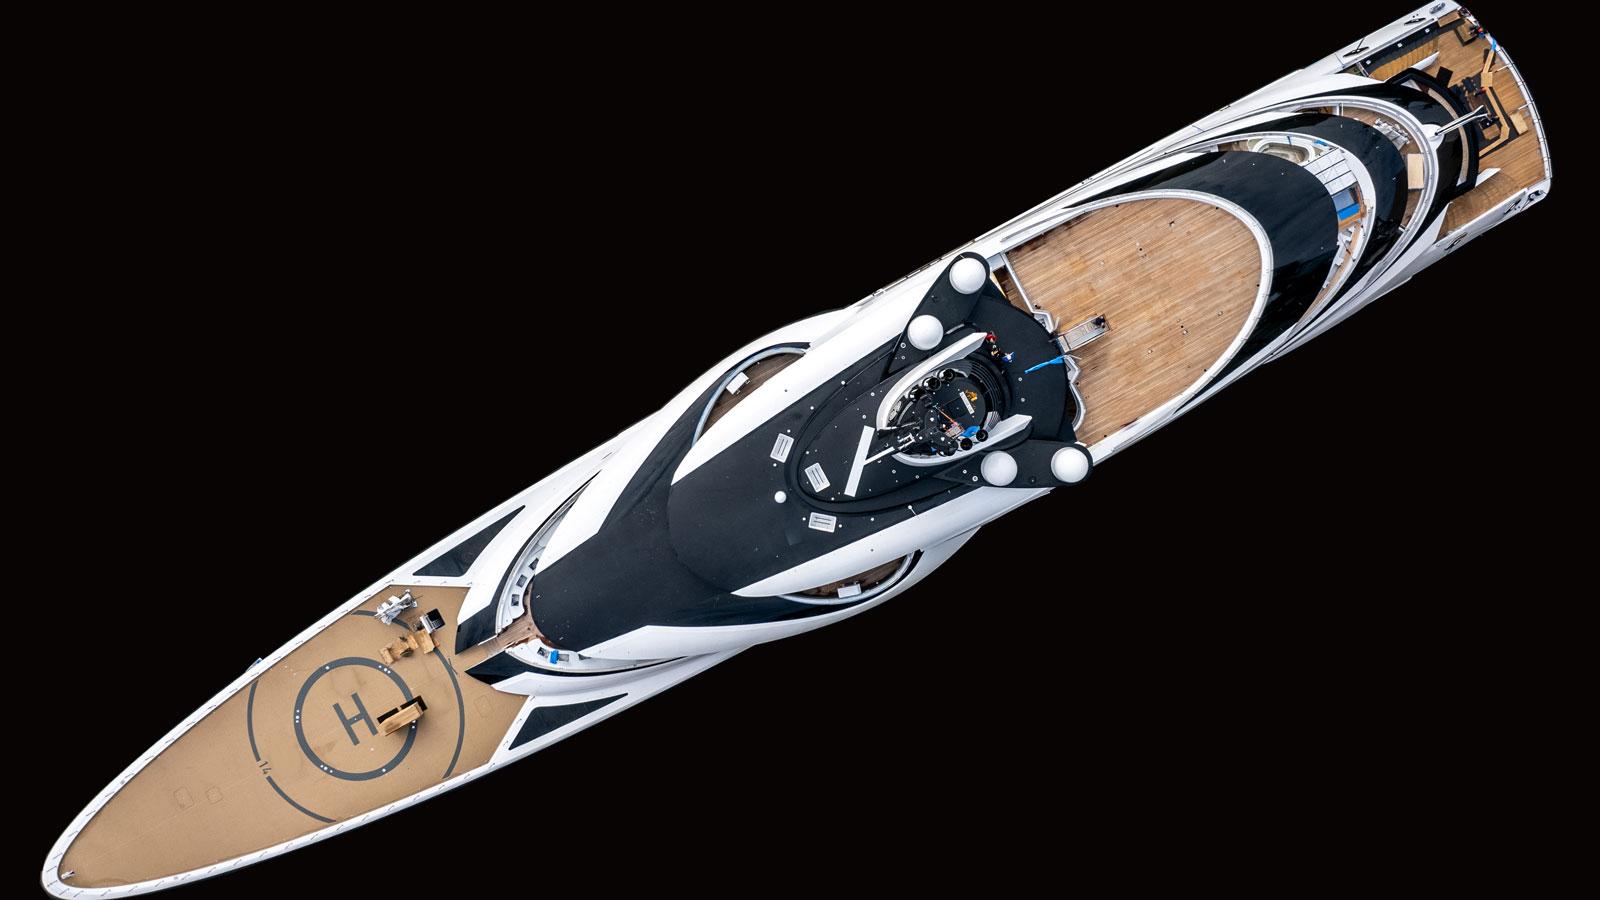 Project Enzo Lurssen superyacht